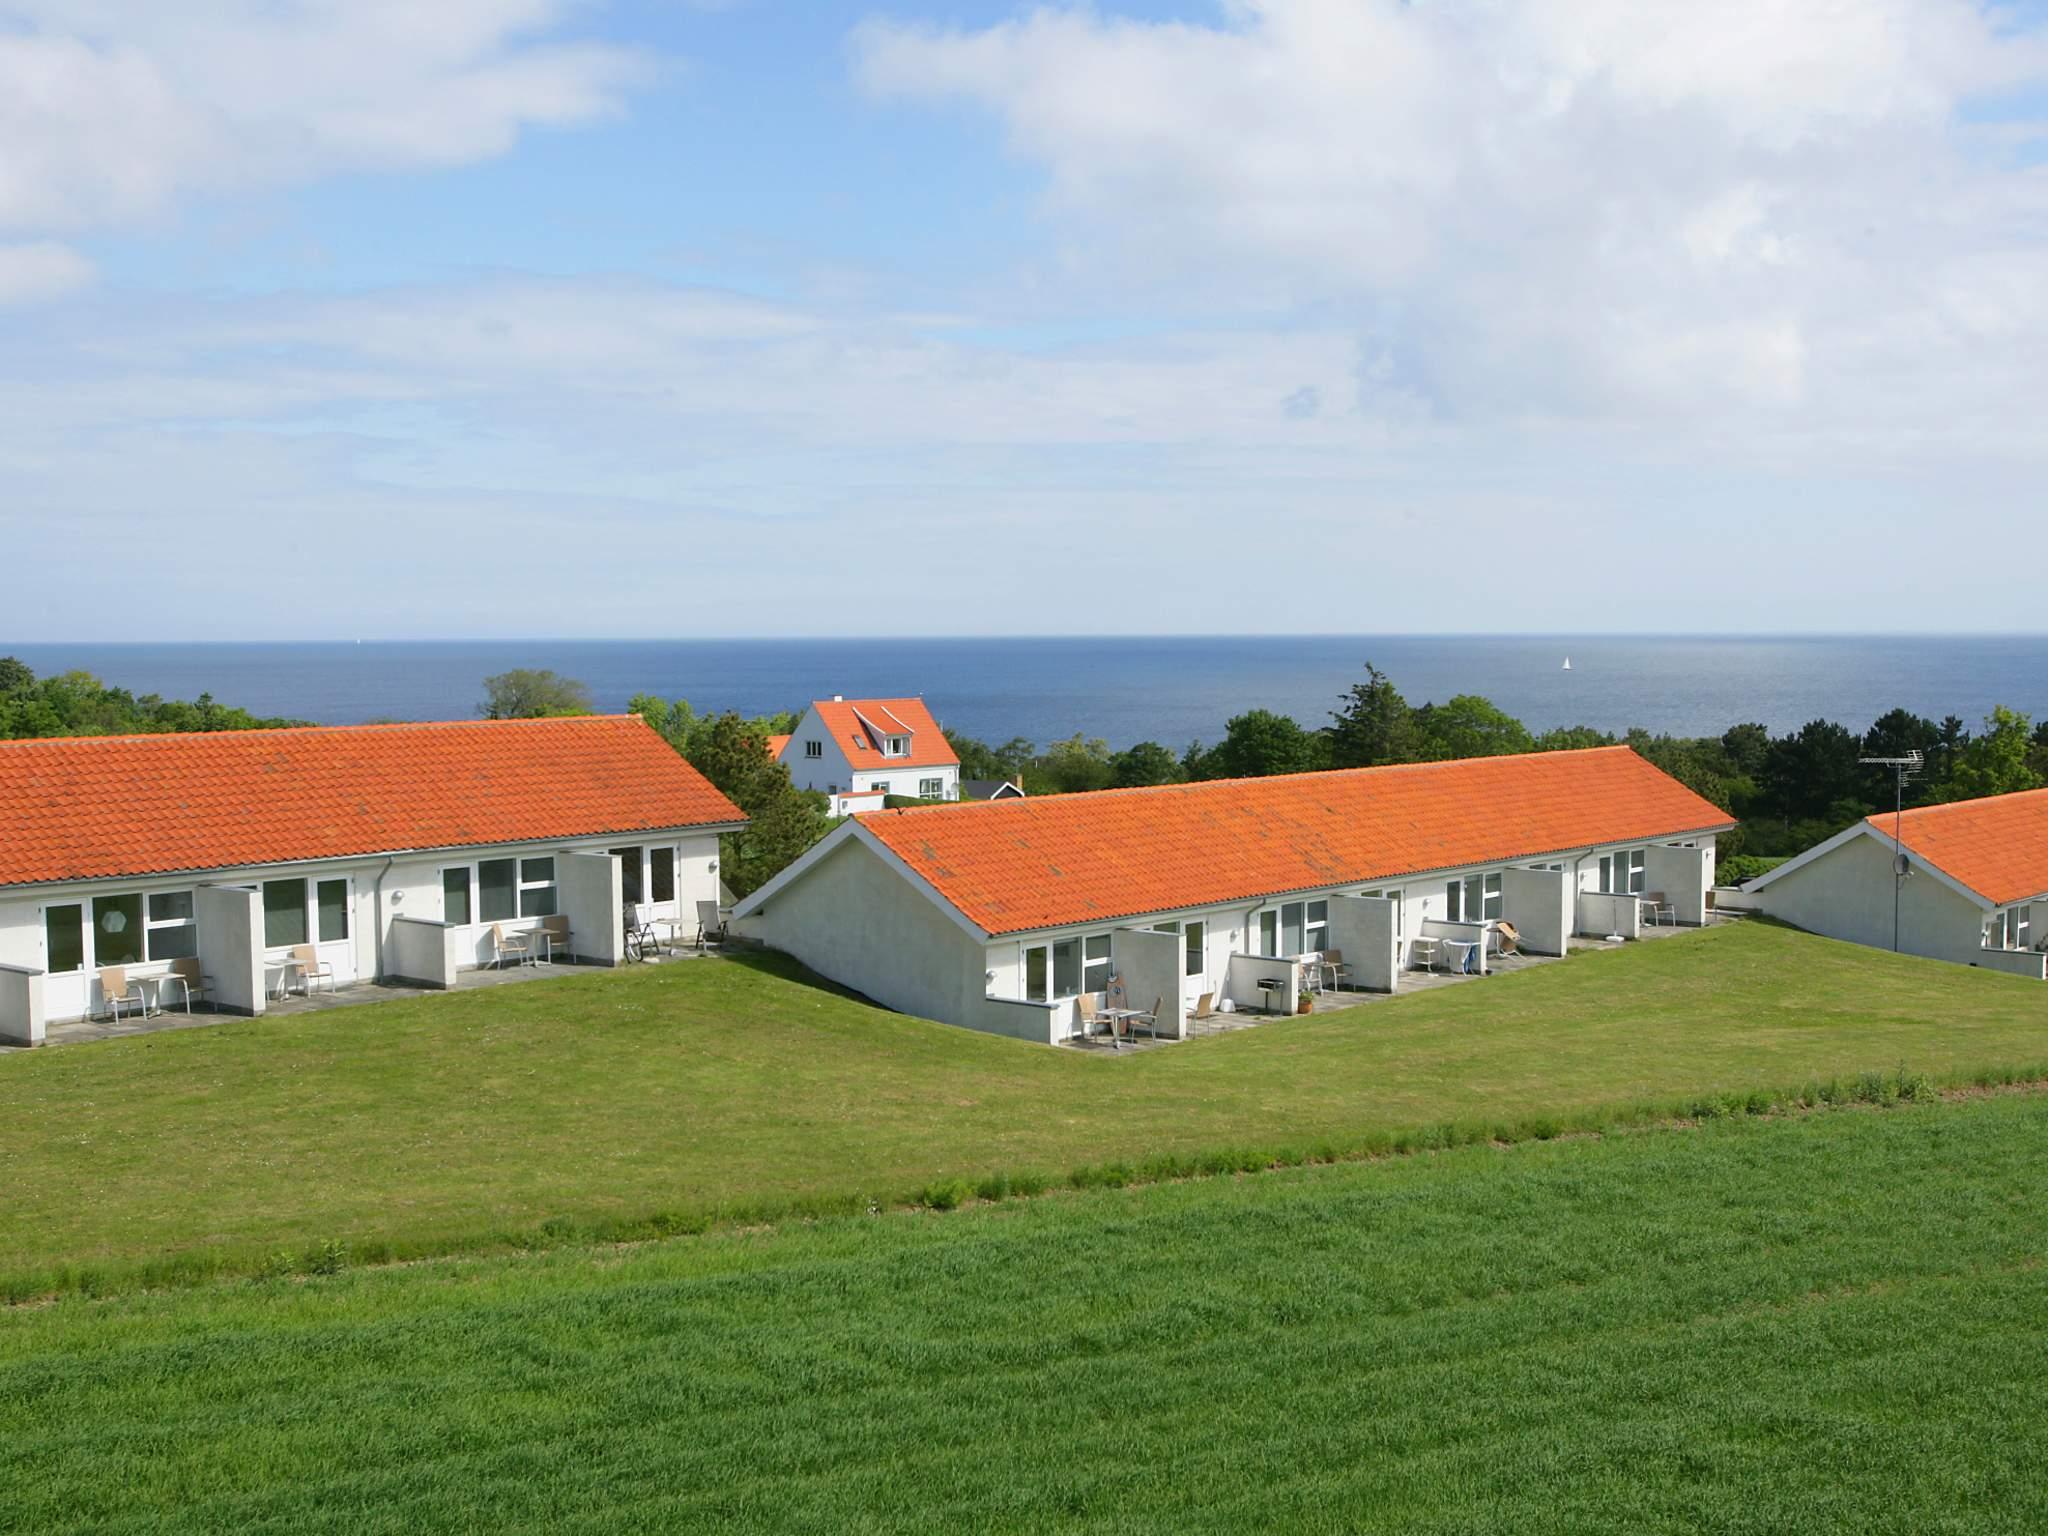 Ferienwohnung Sandkås (259917), Sandkås, , Bornholm, Dänemark, Bild 1